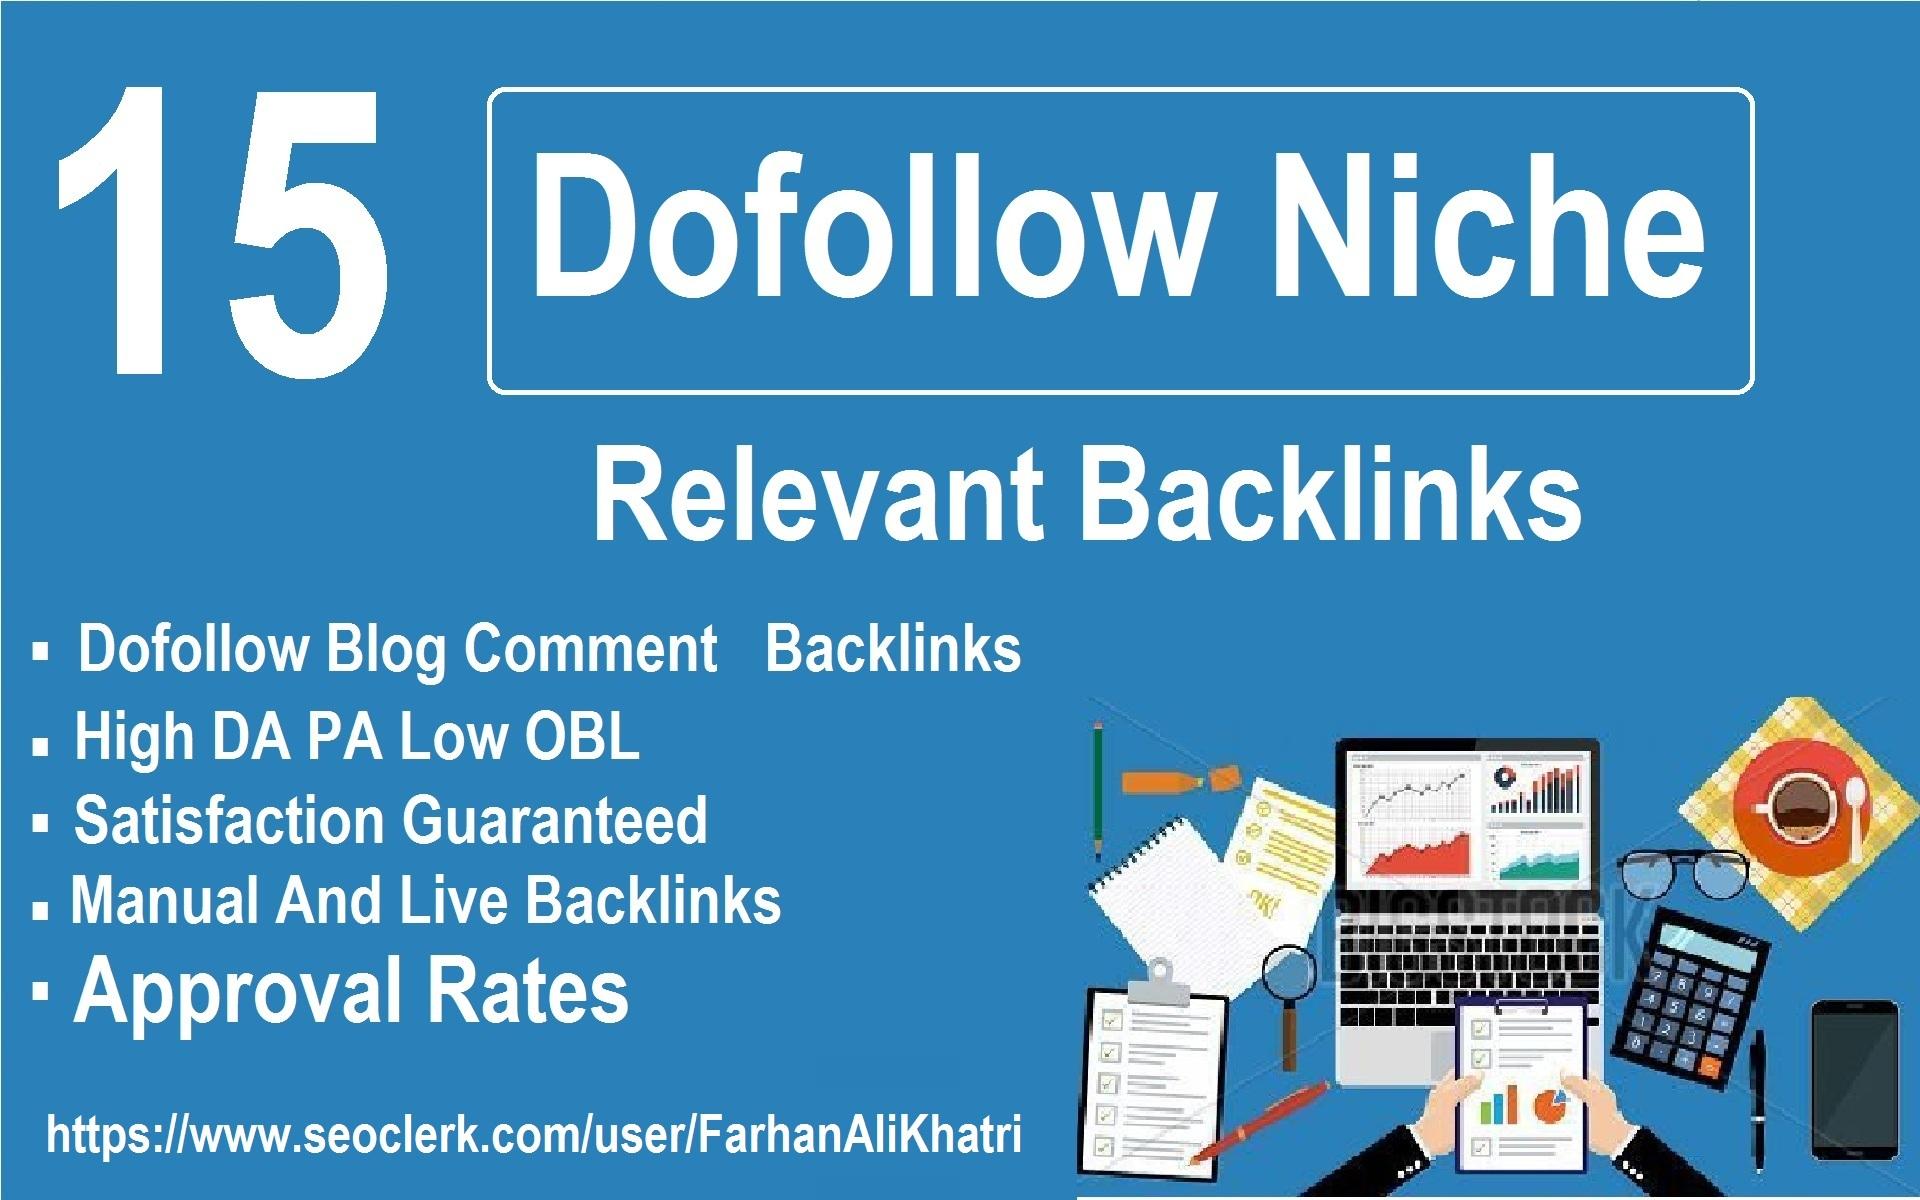 I Will Do 15 Niche Relevant Seo Service Dofollow Backlinks